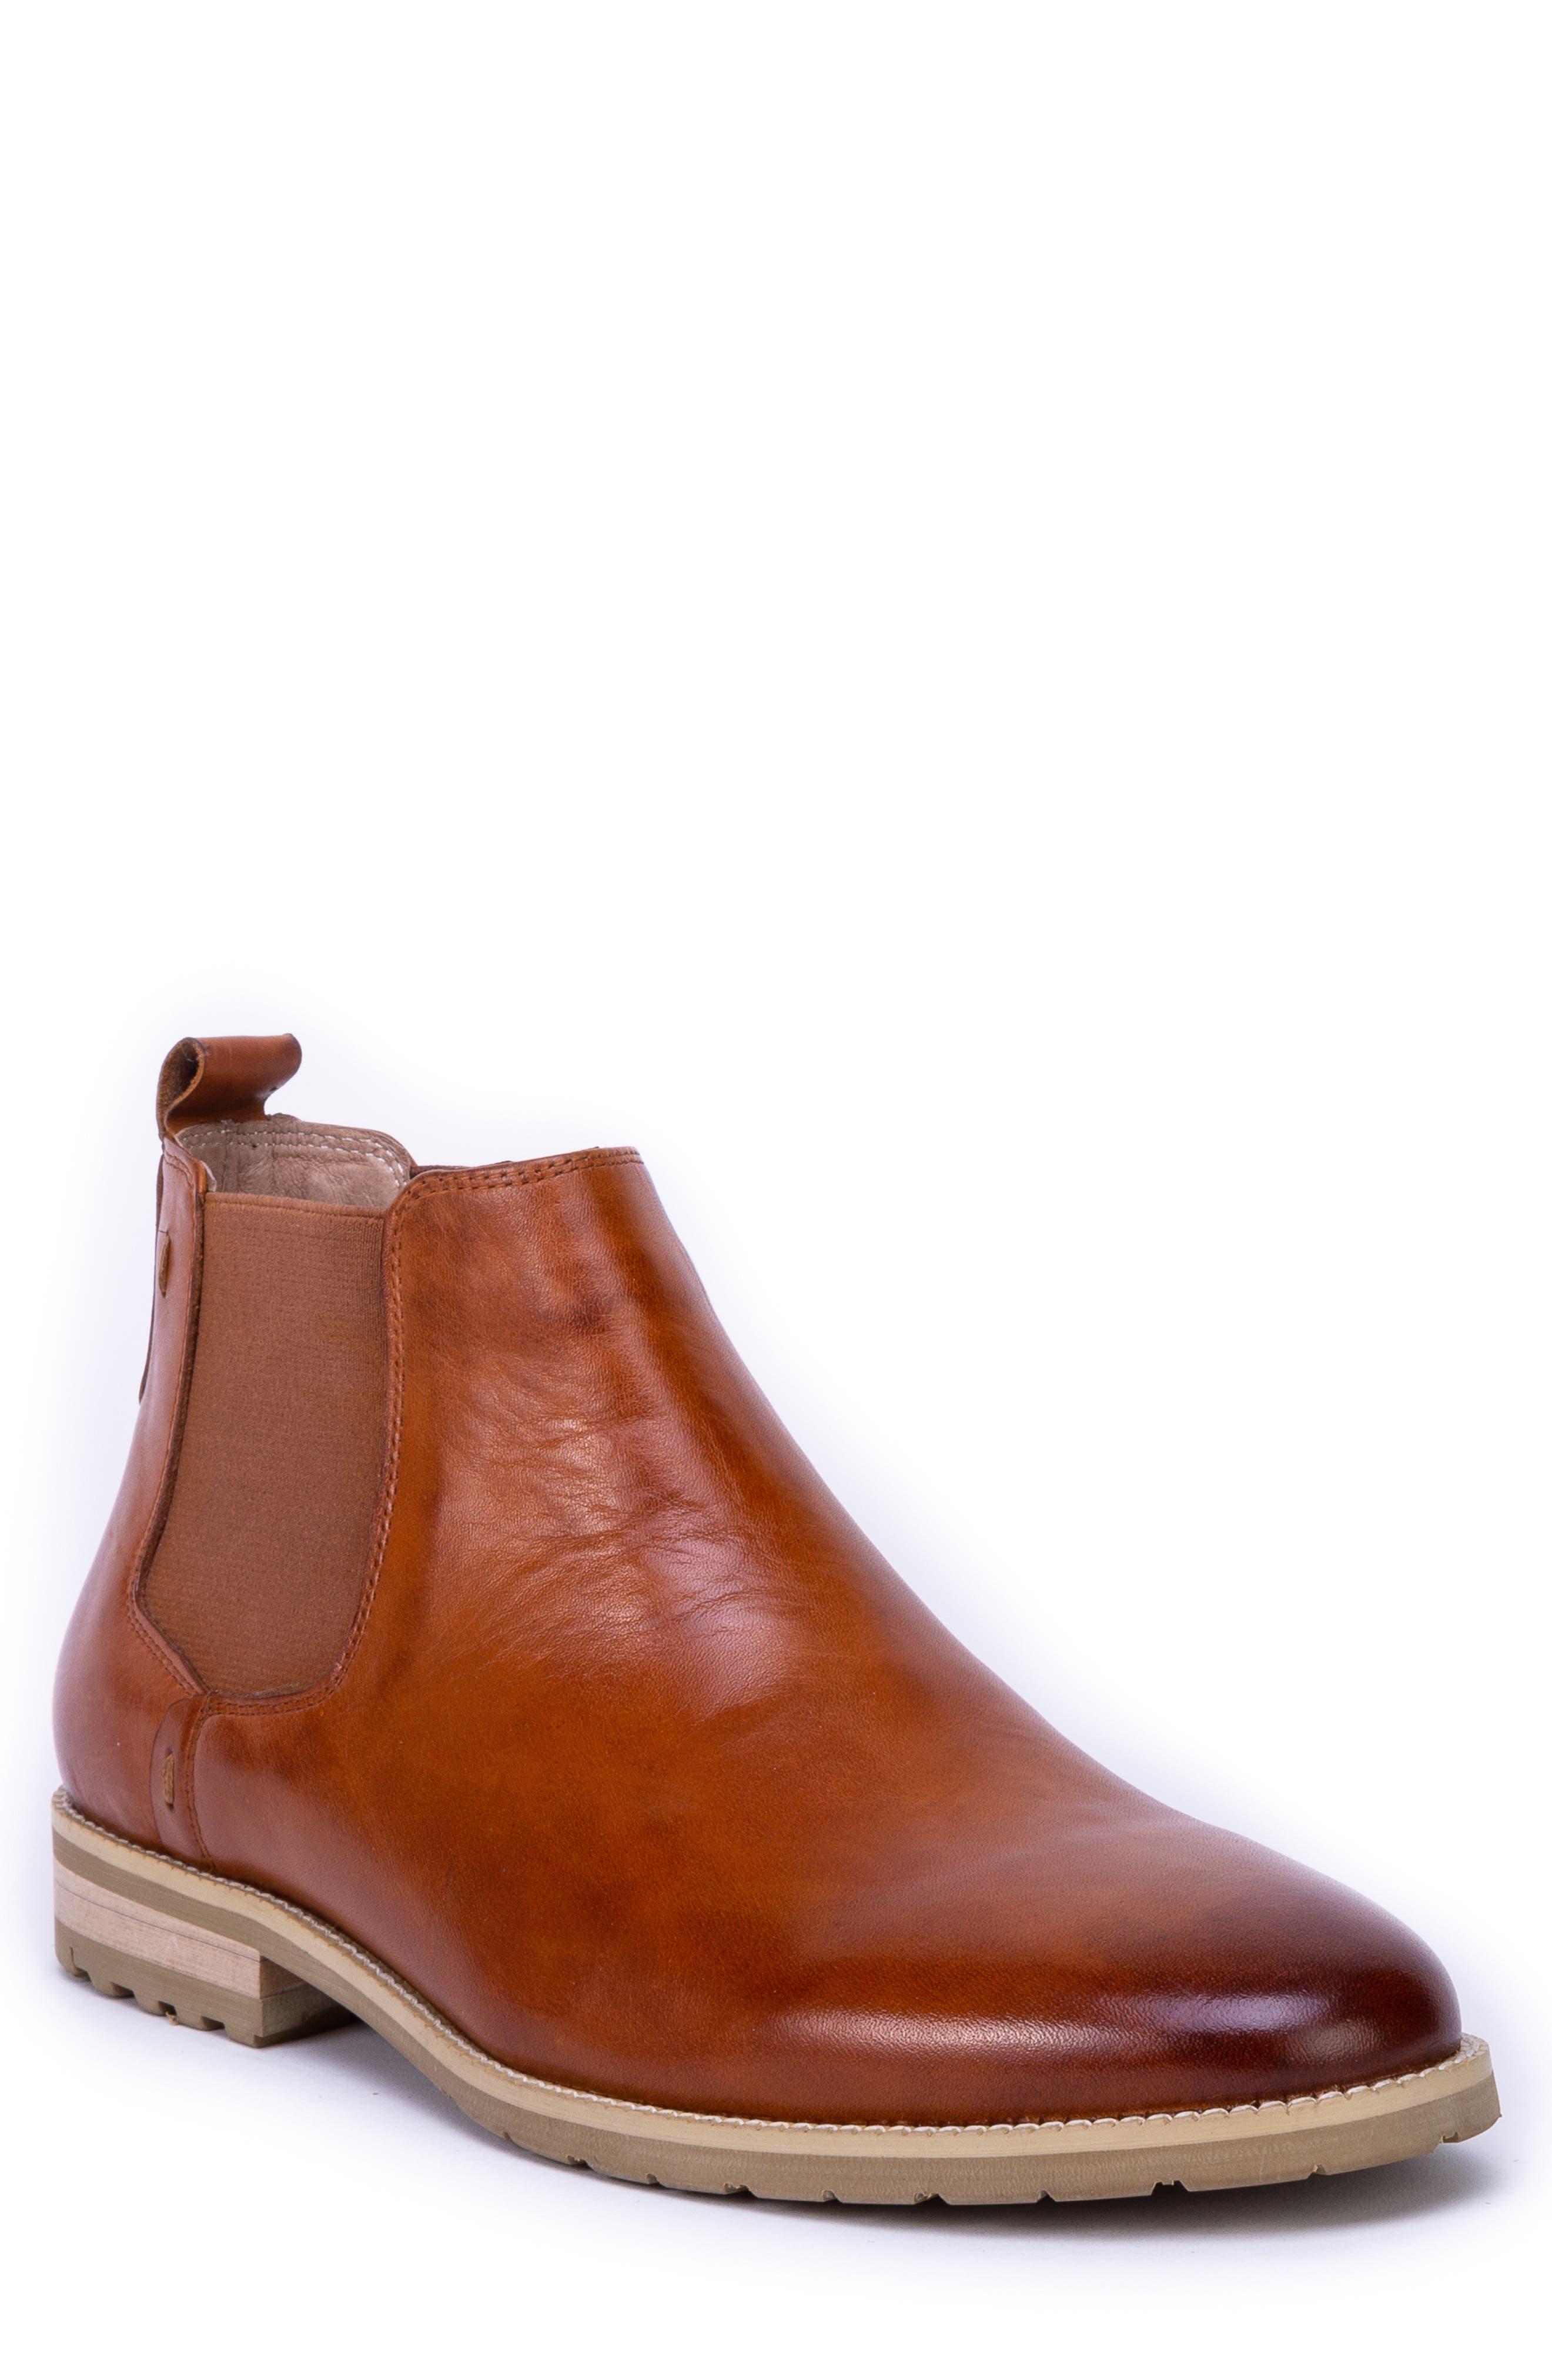 Zanzara Woody Chelsea Boot, Brown